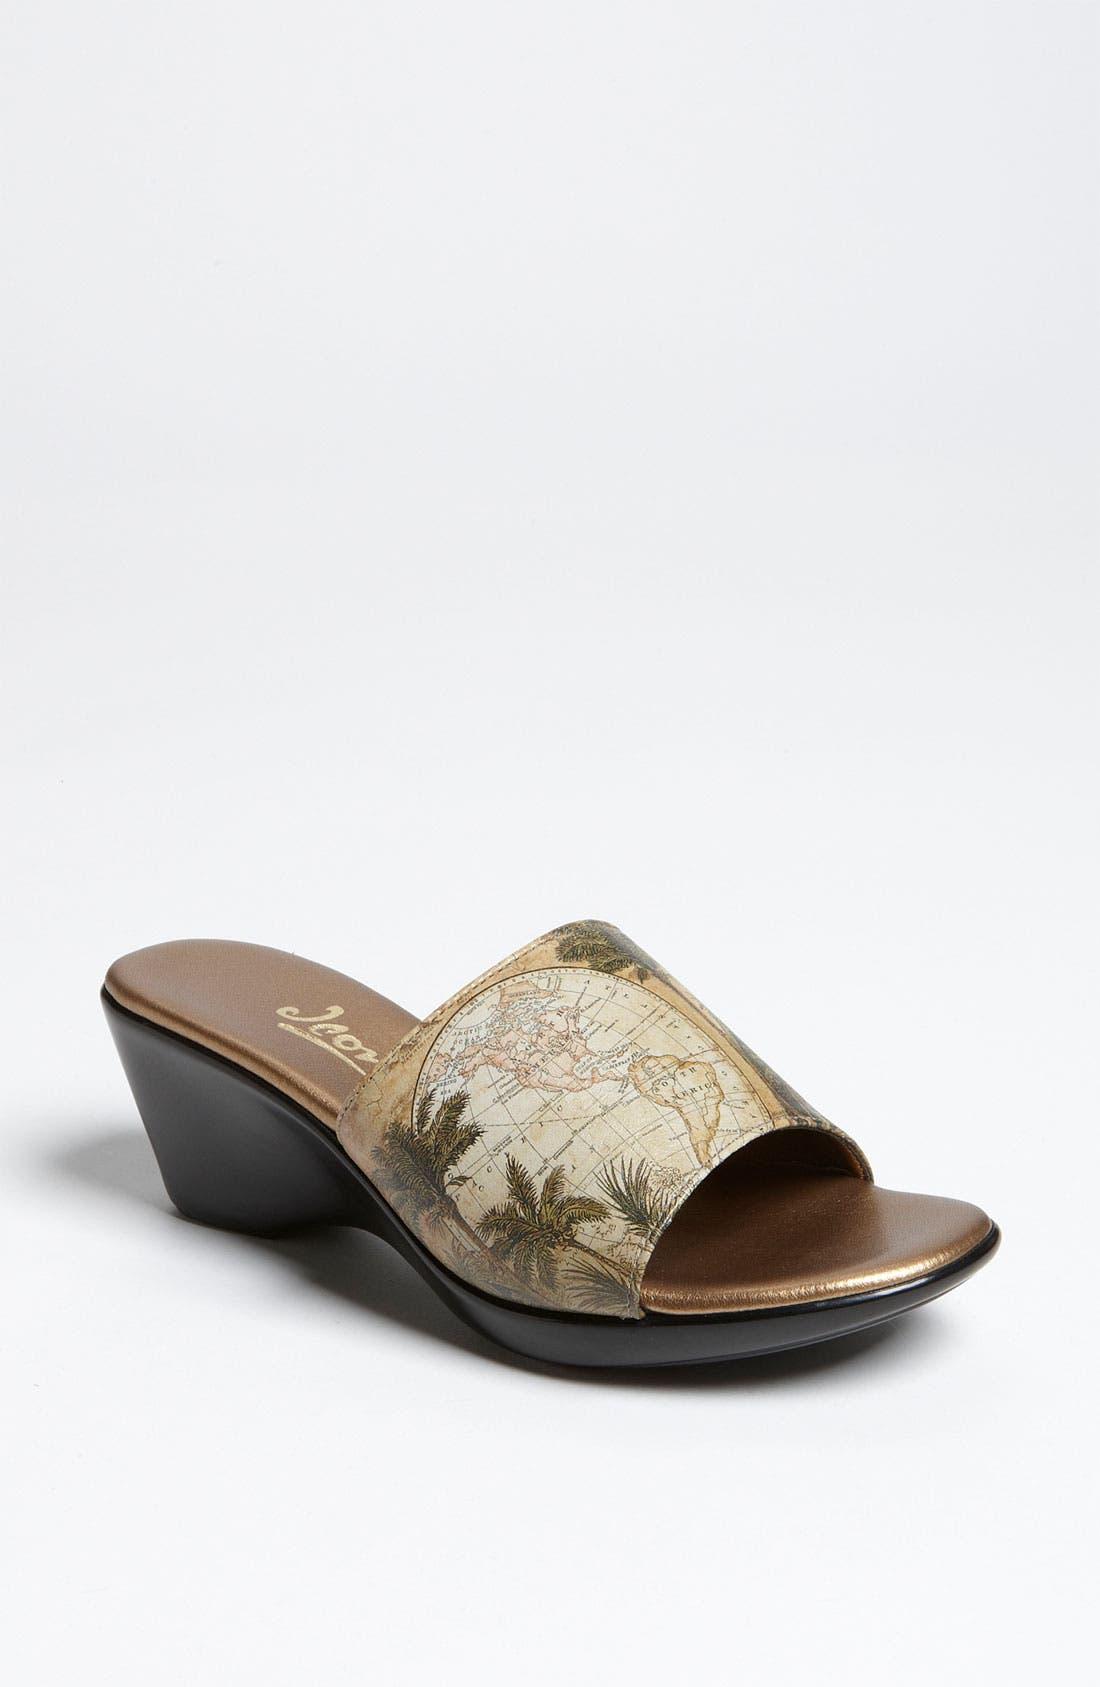 Main Image - Icon Footwear 'Global Safari' Sandal